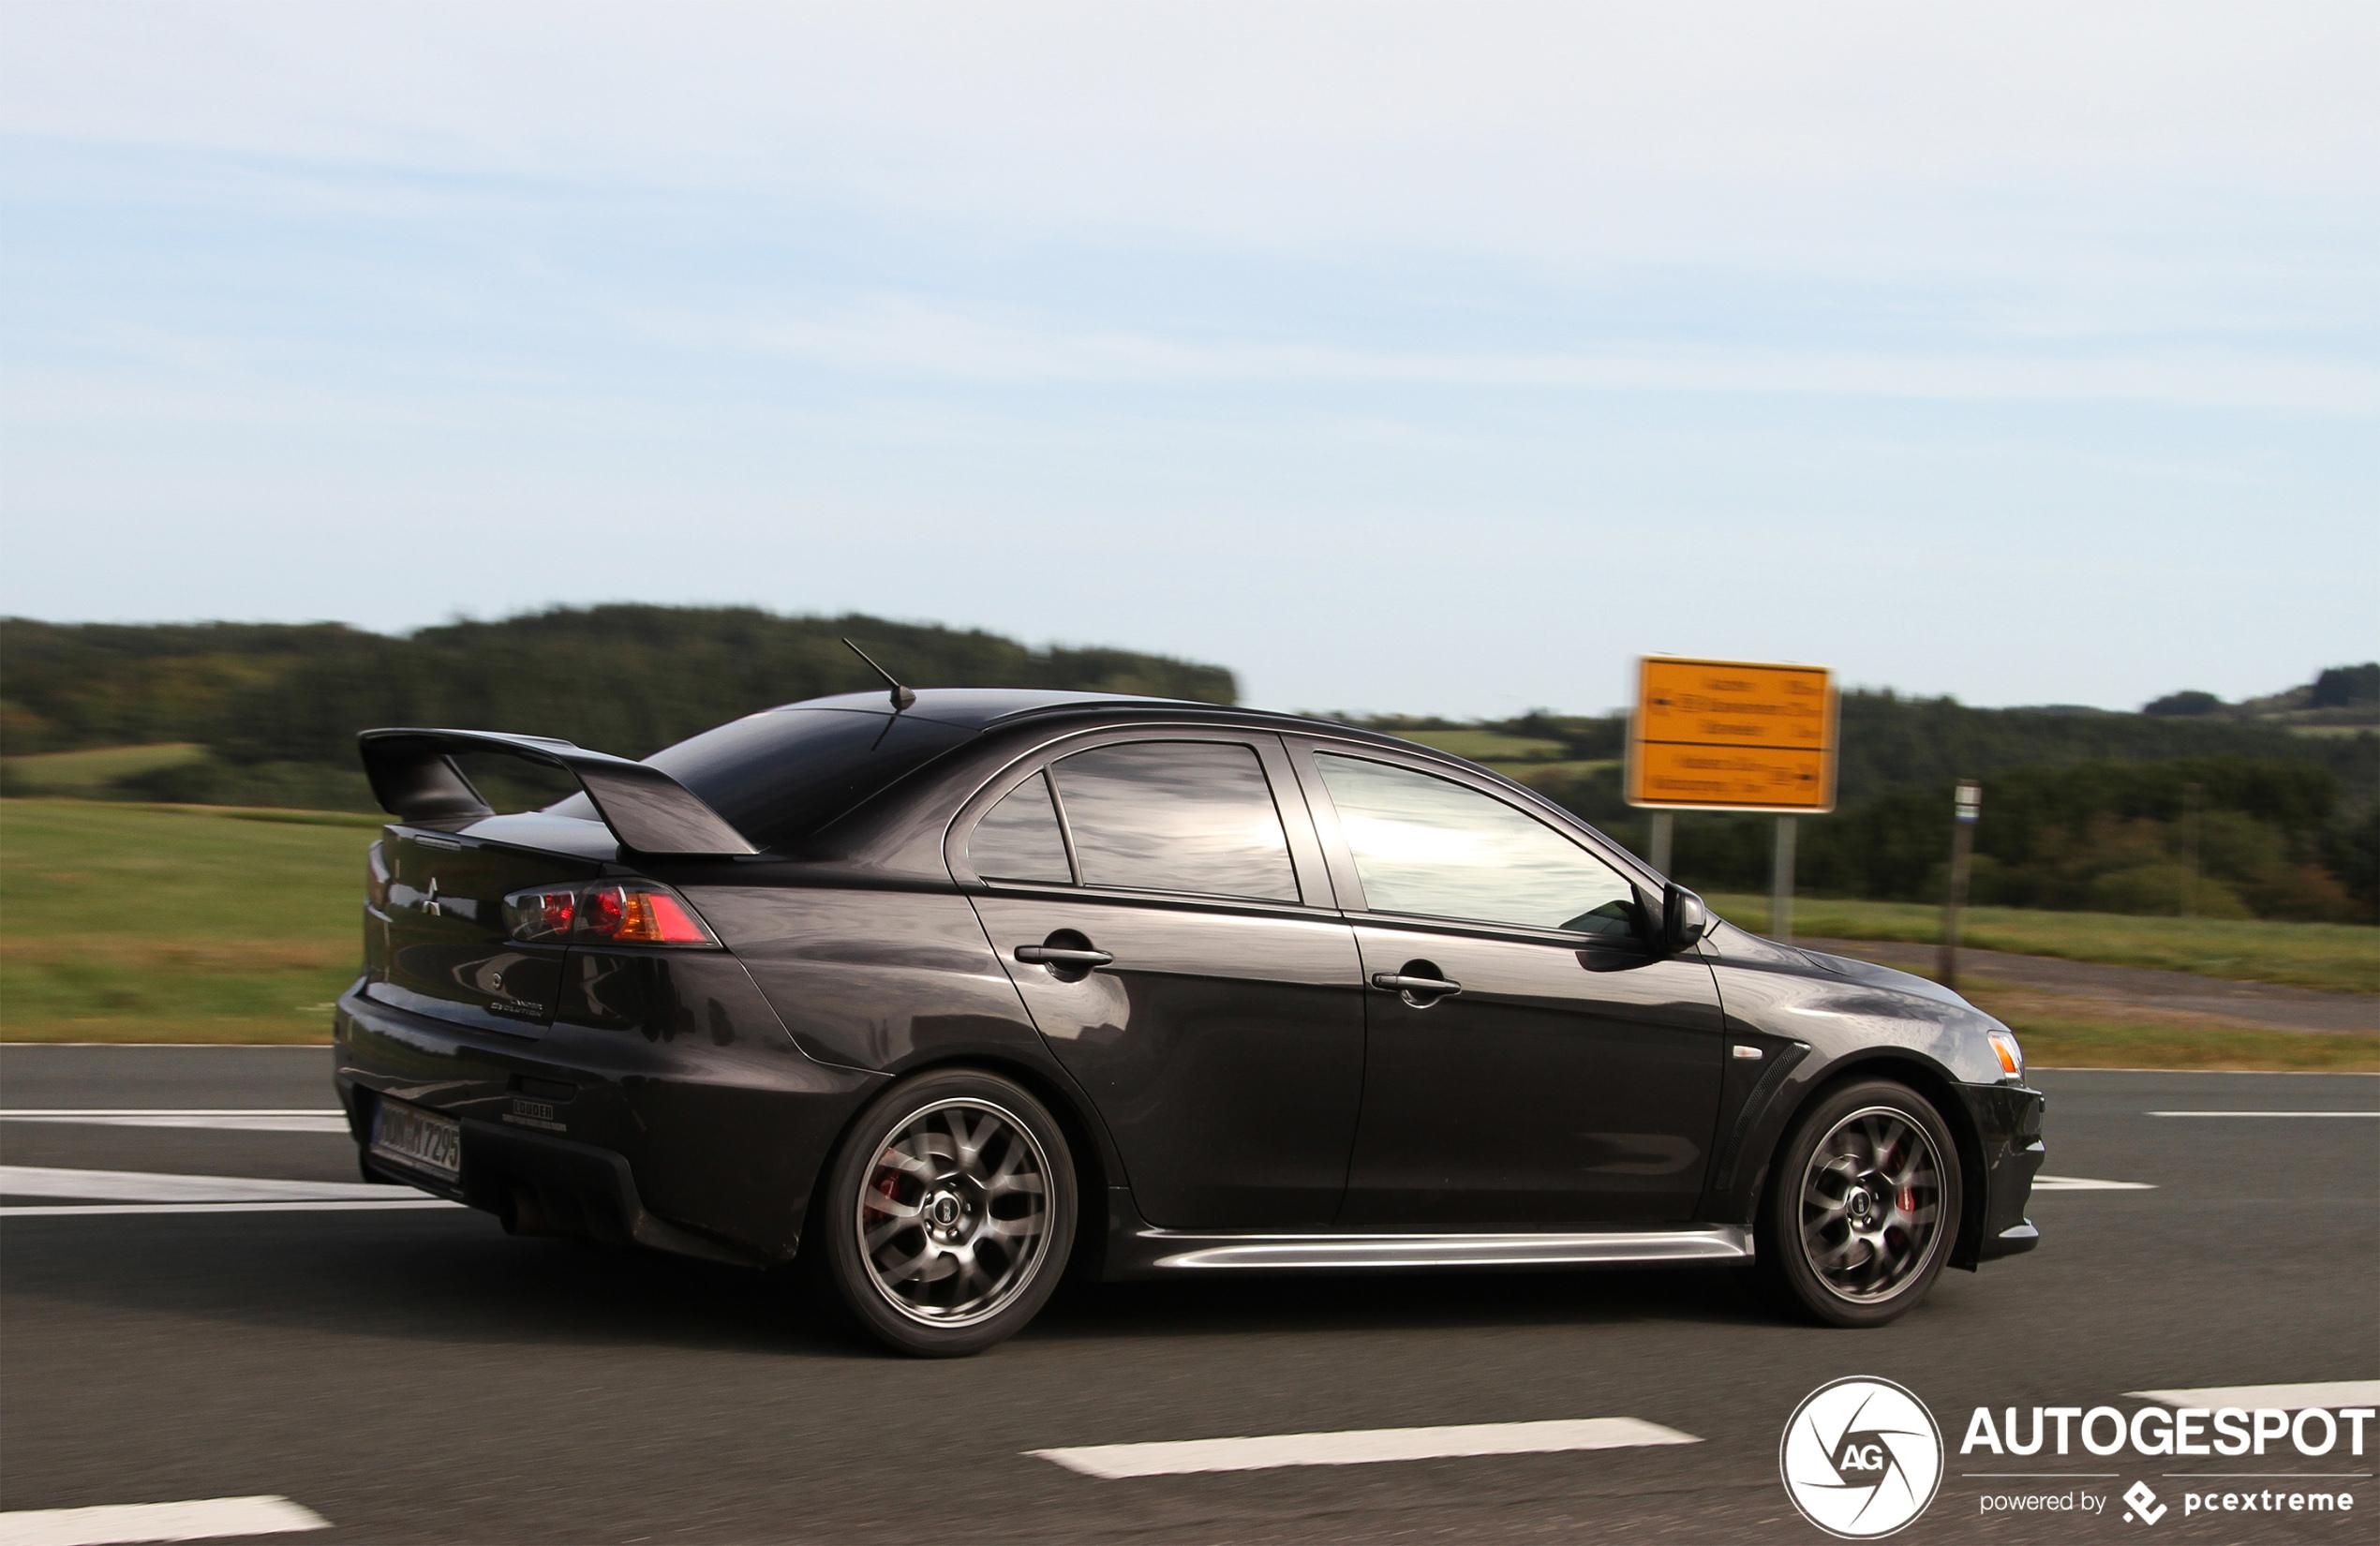 mitsubishi lancer evolution x  3 january 2020  autogespot